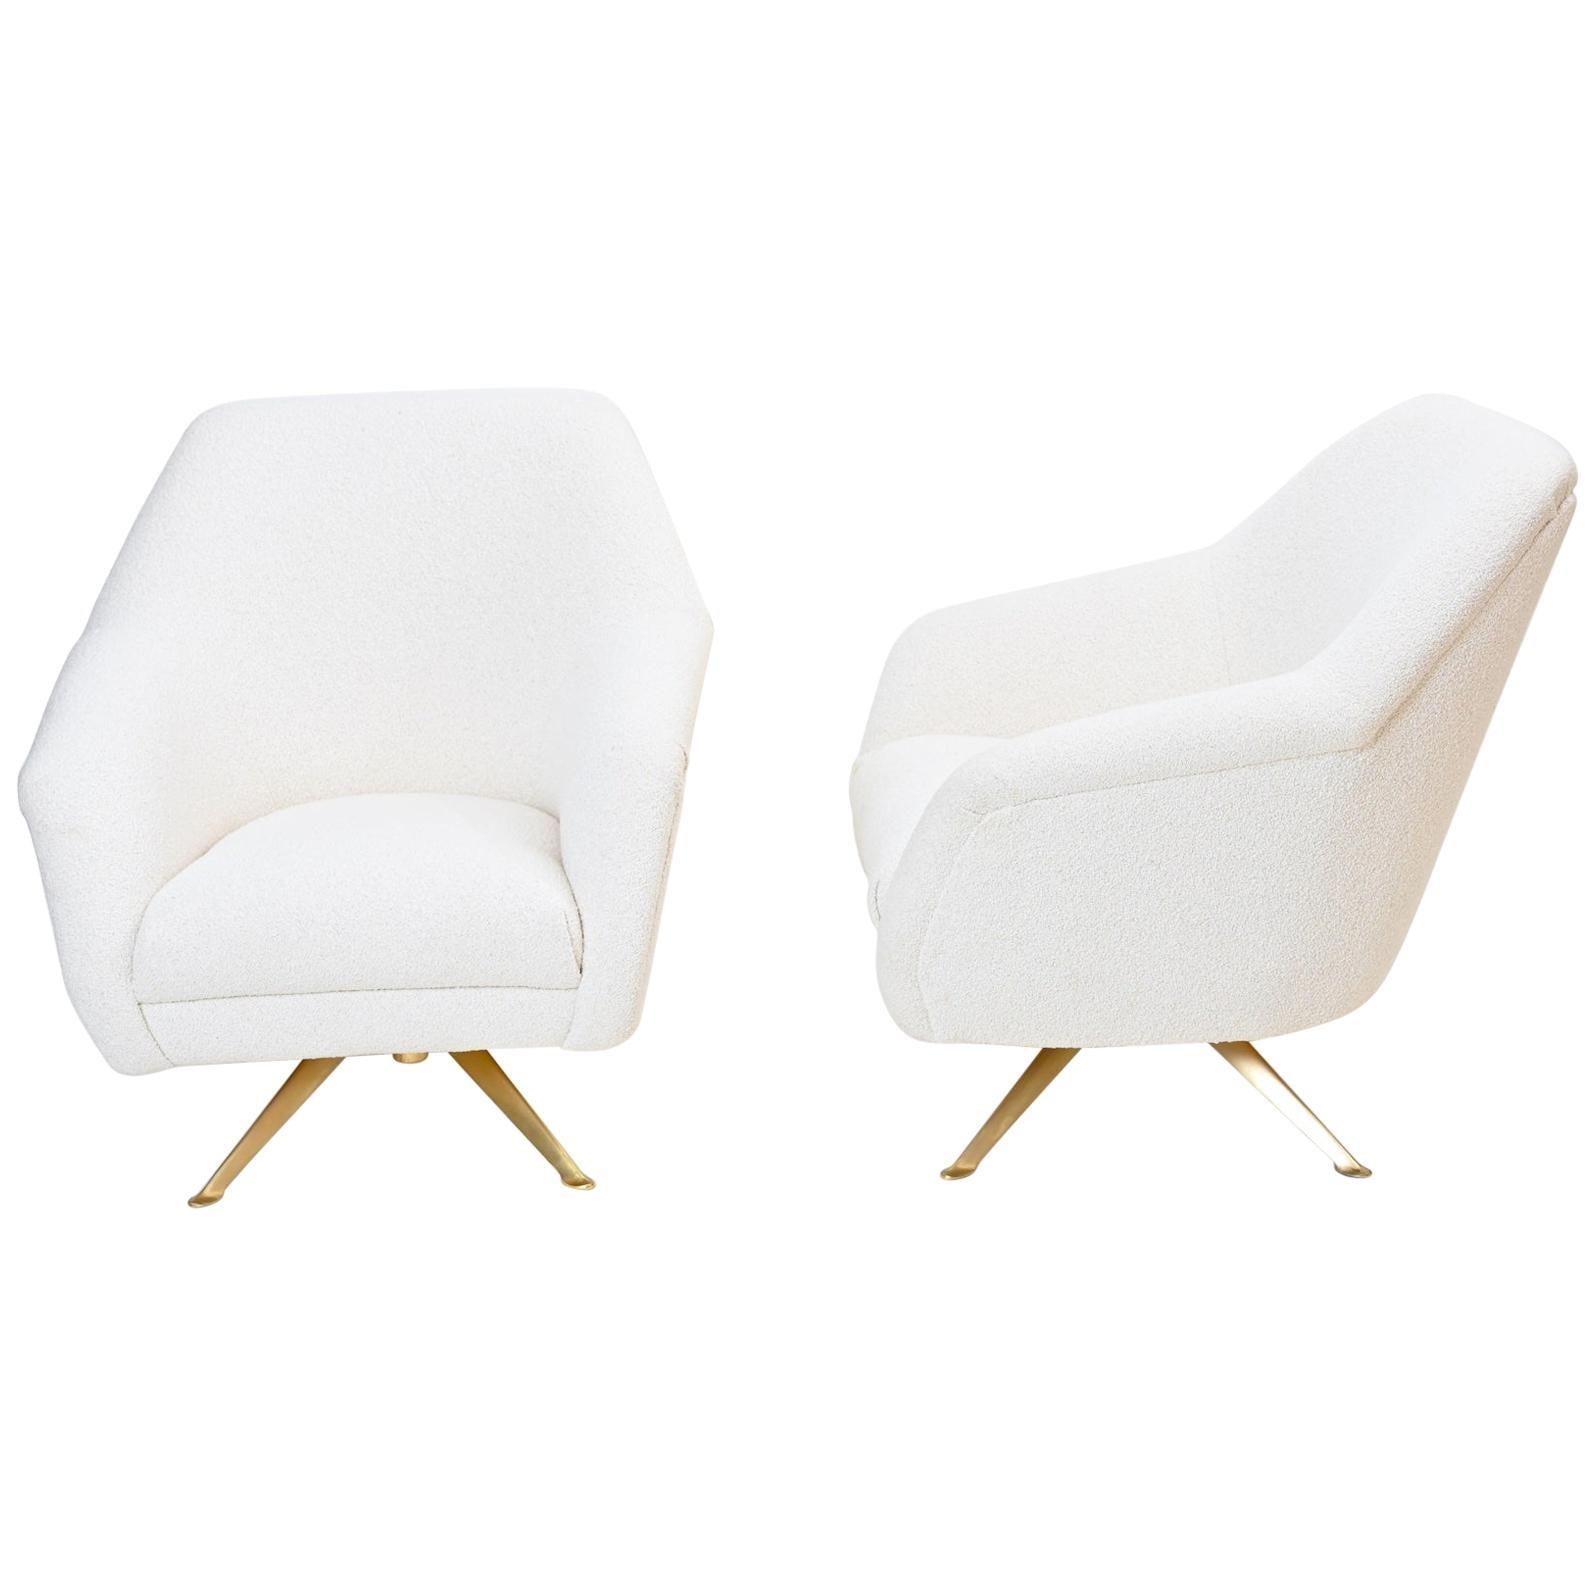 Pair of Rare Osvaldo Borsani Swivel Lounge Chairs, circa 1951